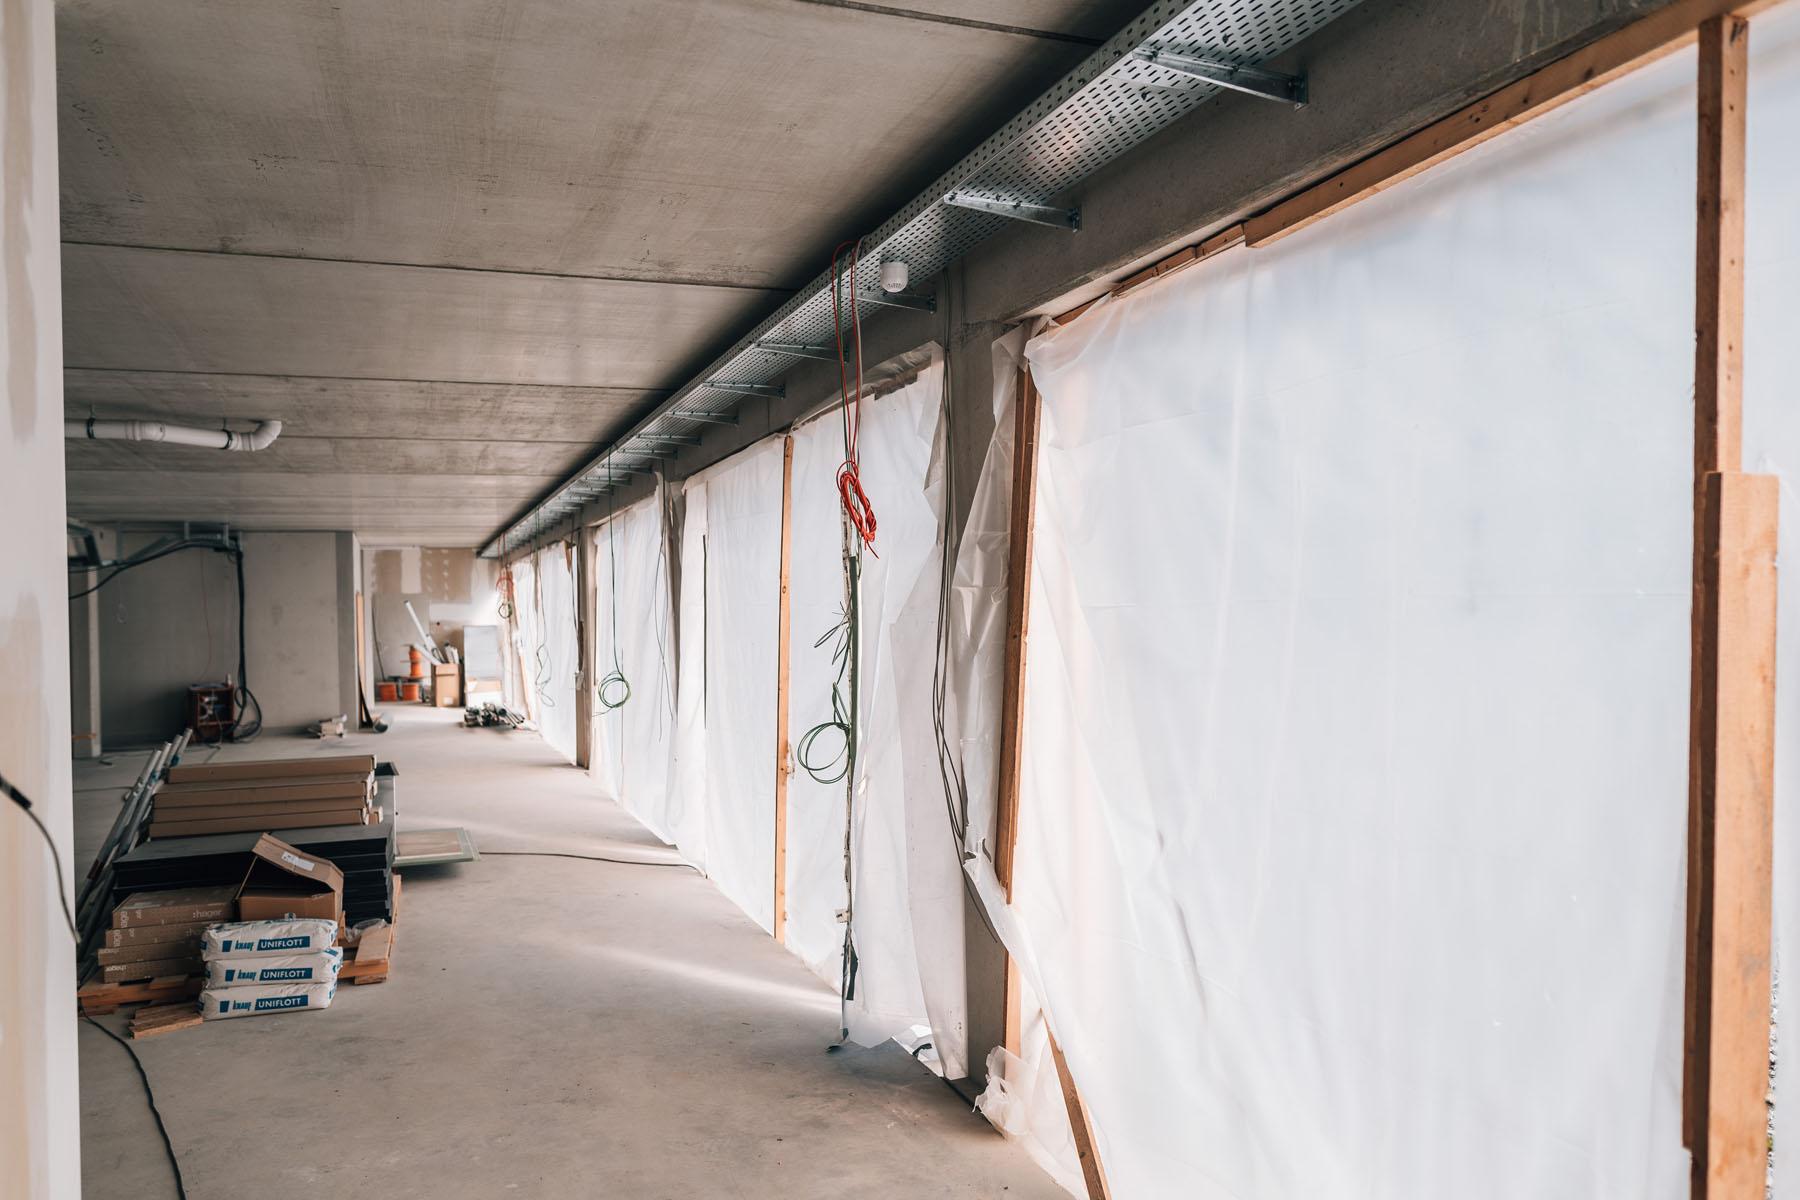 ITES-20190723-Baustellenupdate-02295